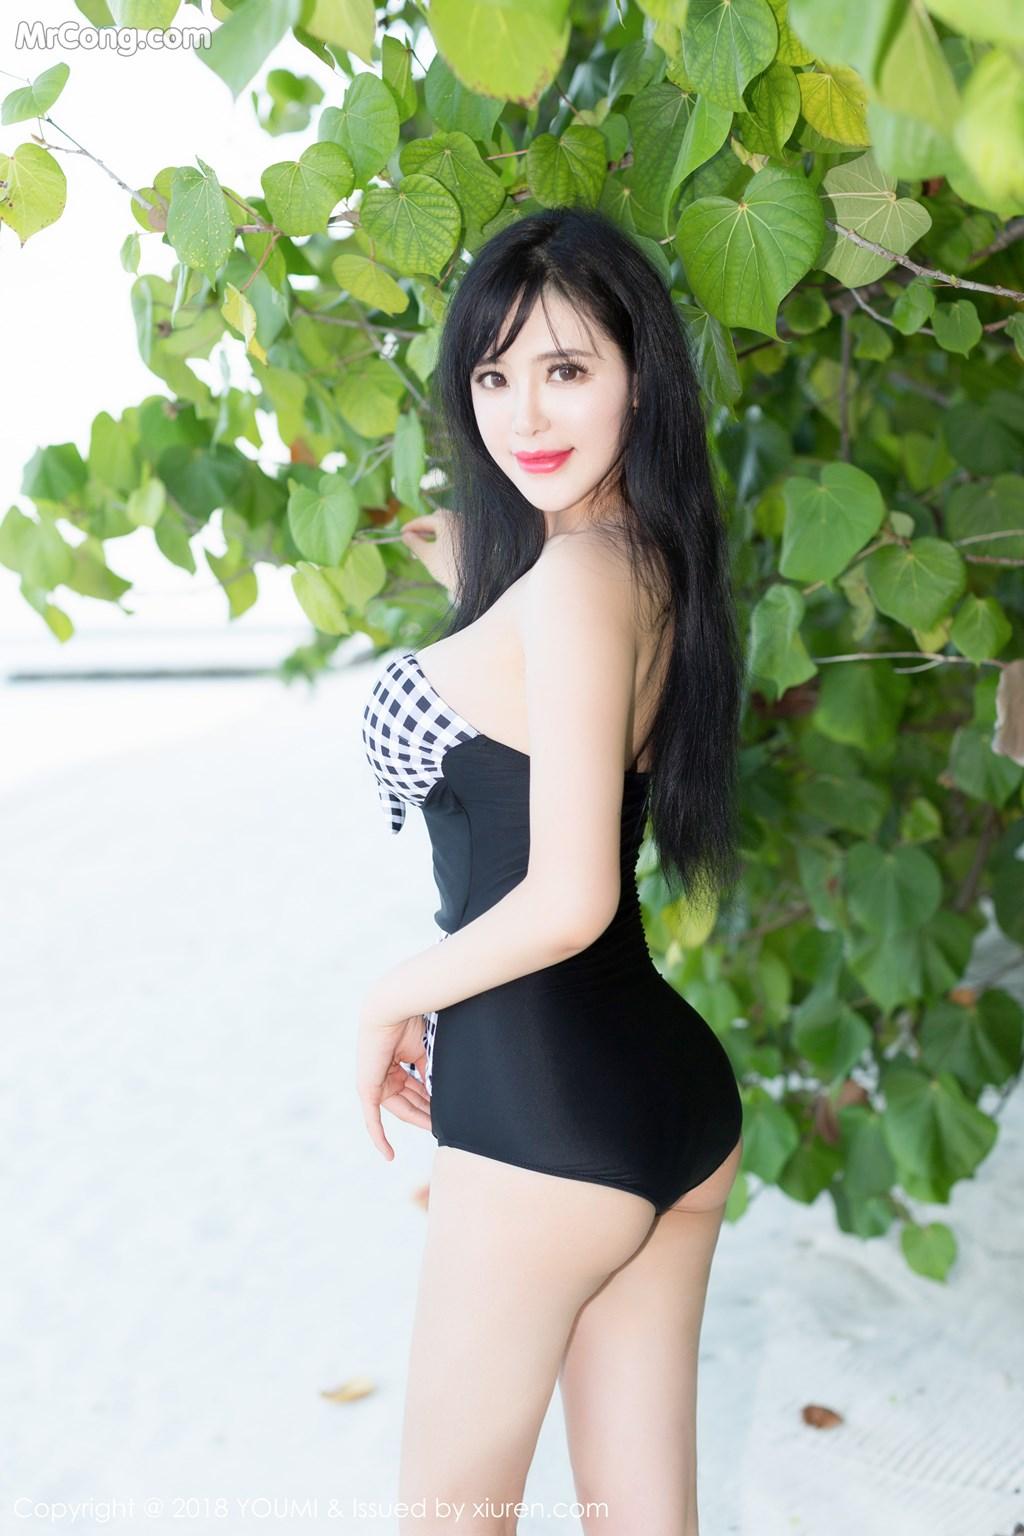 YouMi Vol.189: Model Liu Yu Er (刘 钰 儿) (43 pictures)